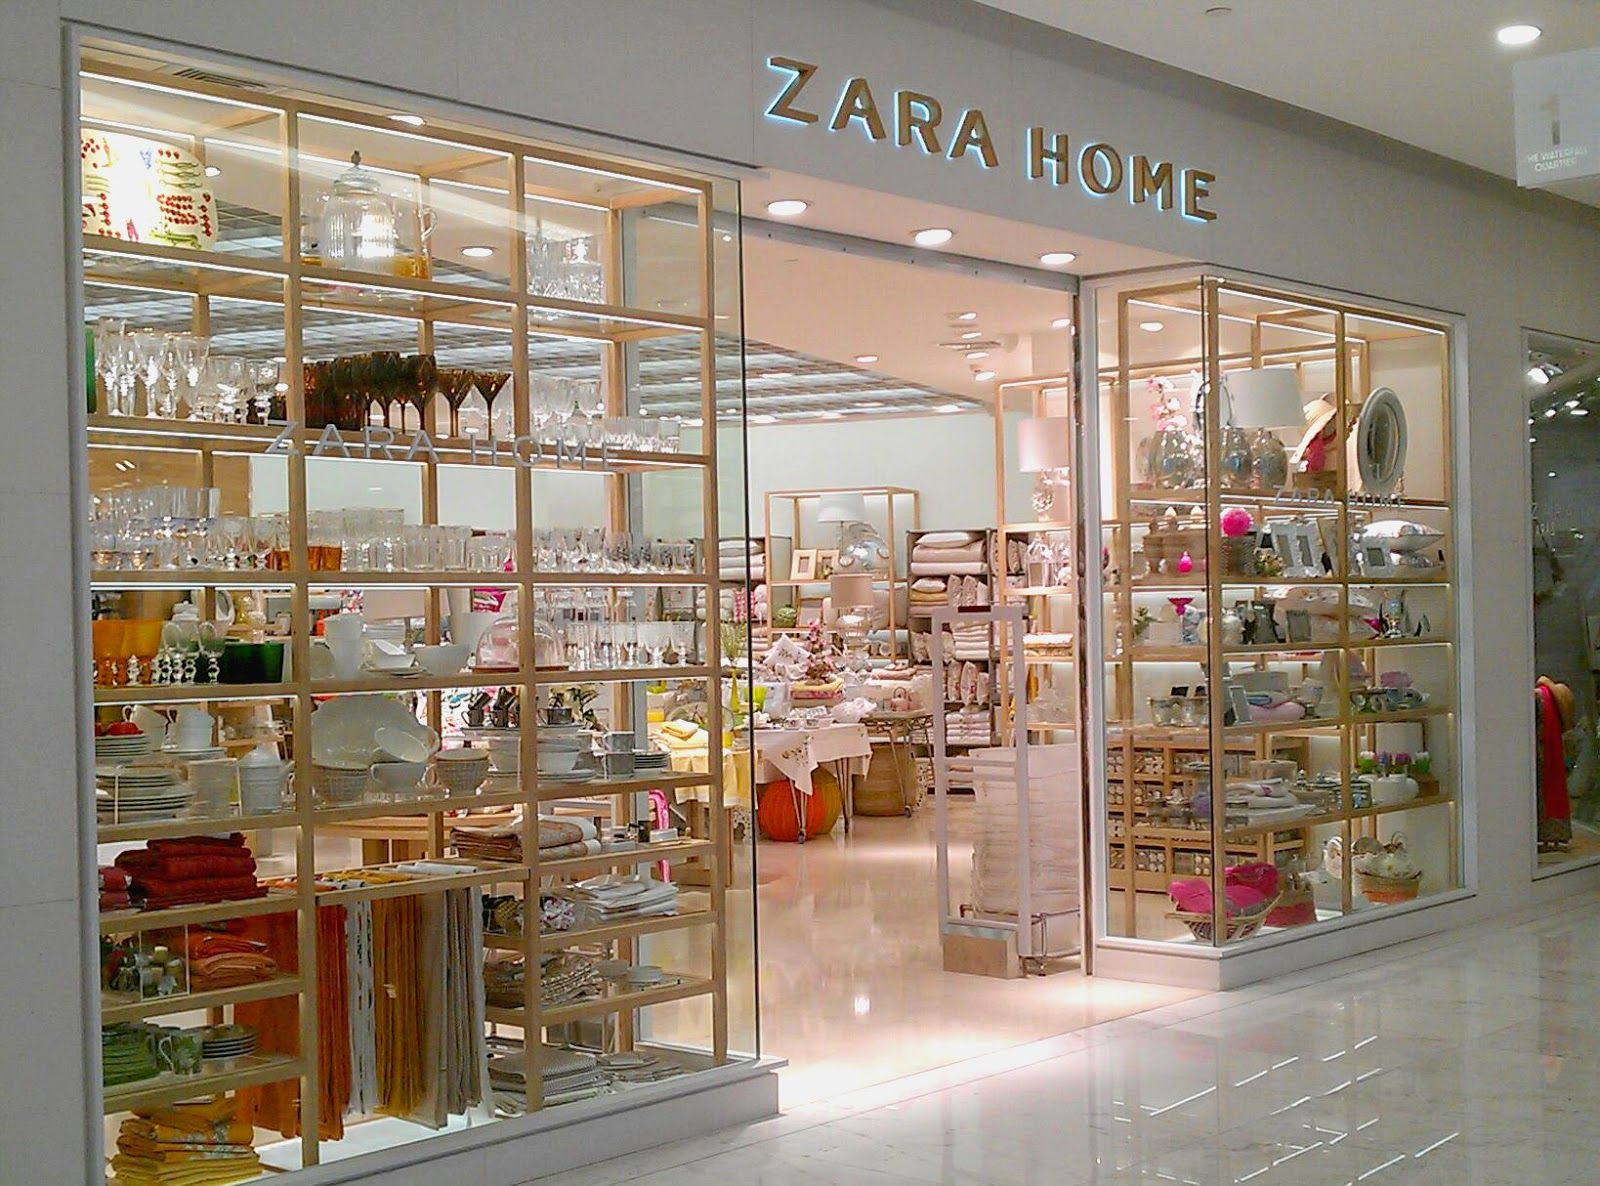 Zara home interior design - Window Display Bangkok Thailand Zara Home Emquartier